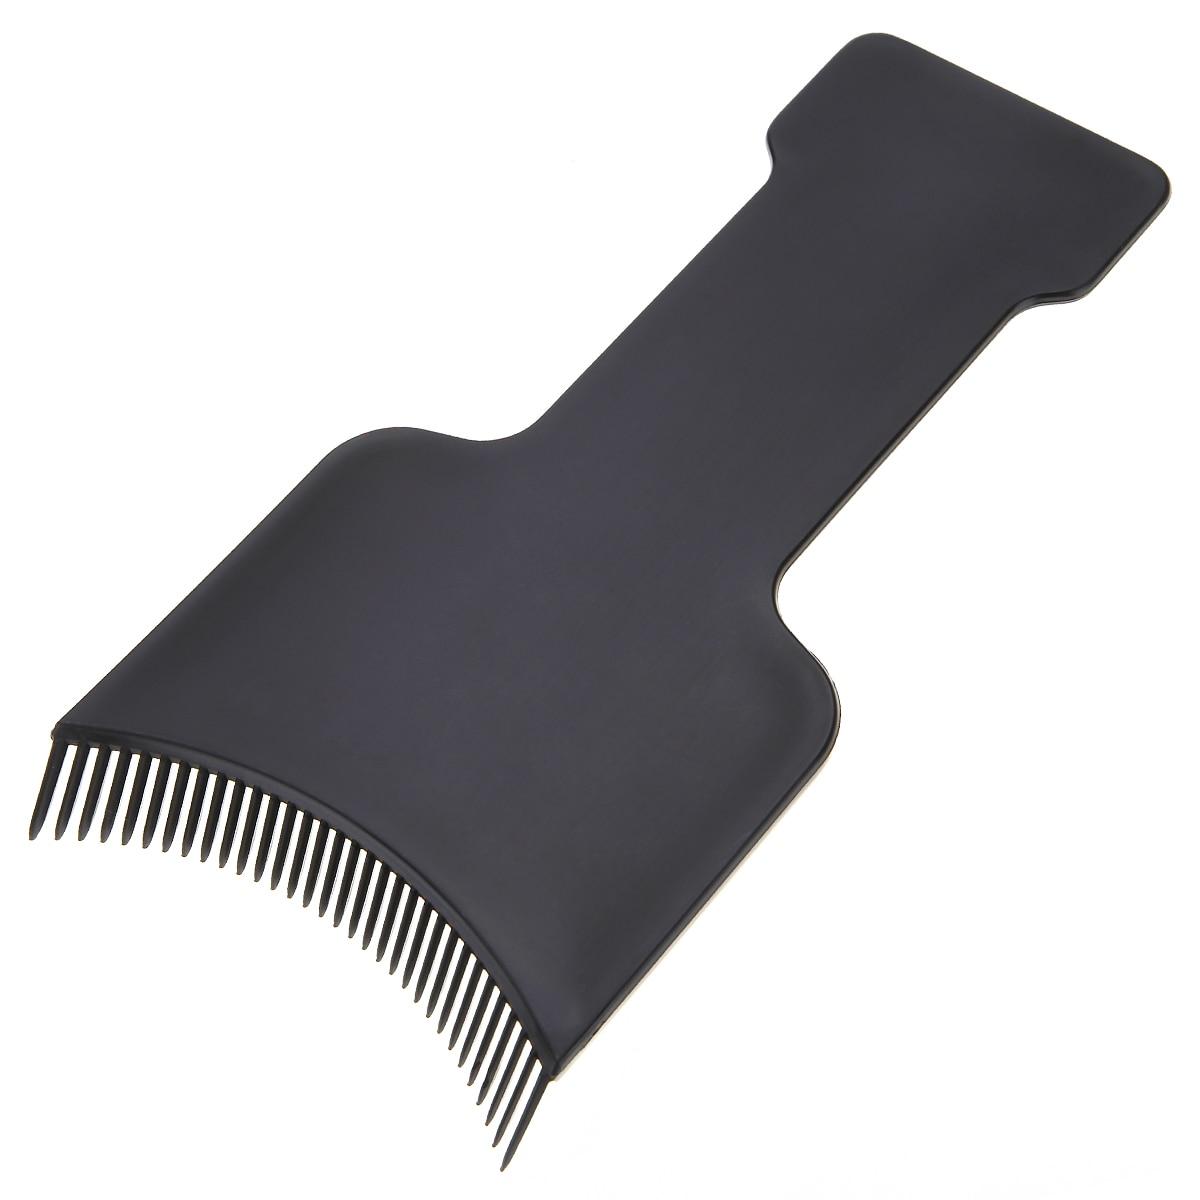 Professional Salon Hair Coloring Dyeing Applicator Brush